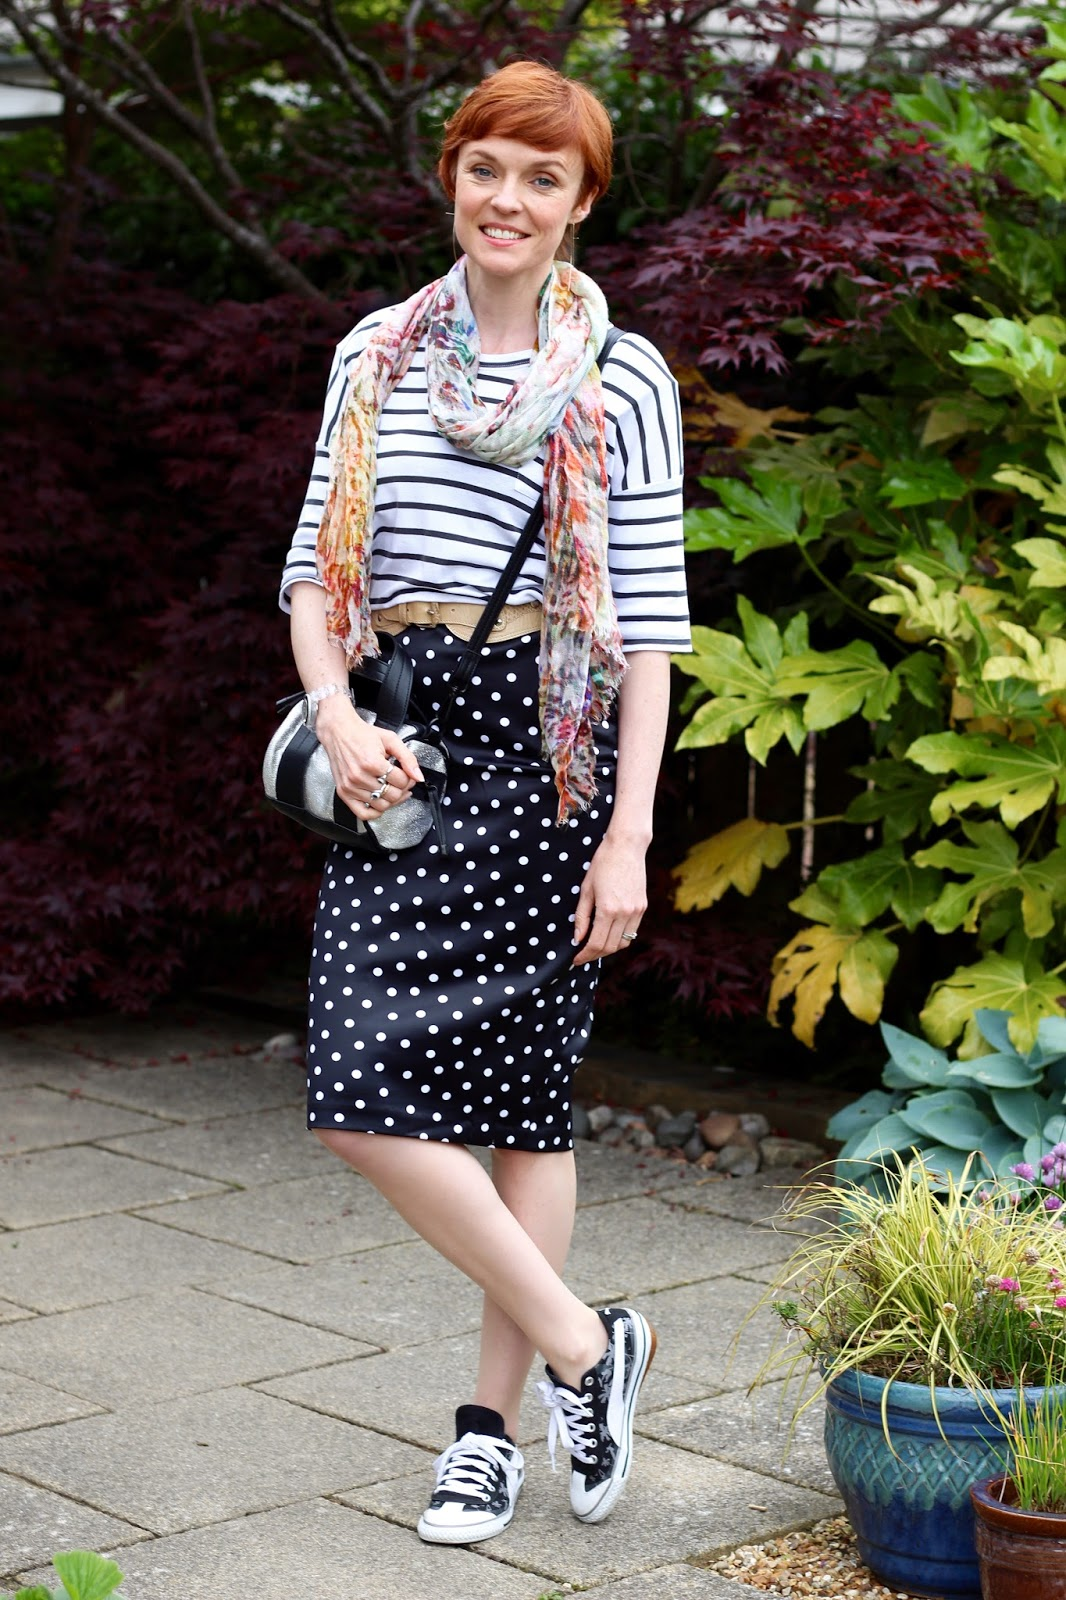 Fake Fabulous | Eveningwear as Daywear | The fab40's, over 40 style.